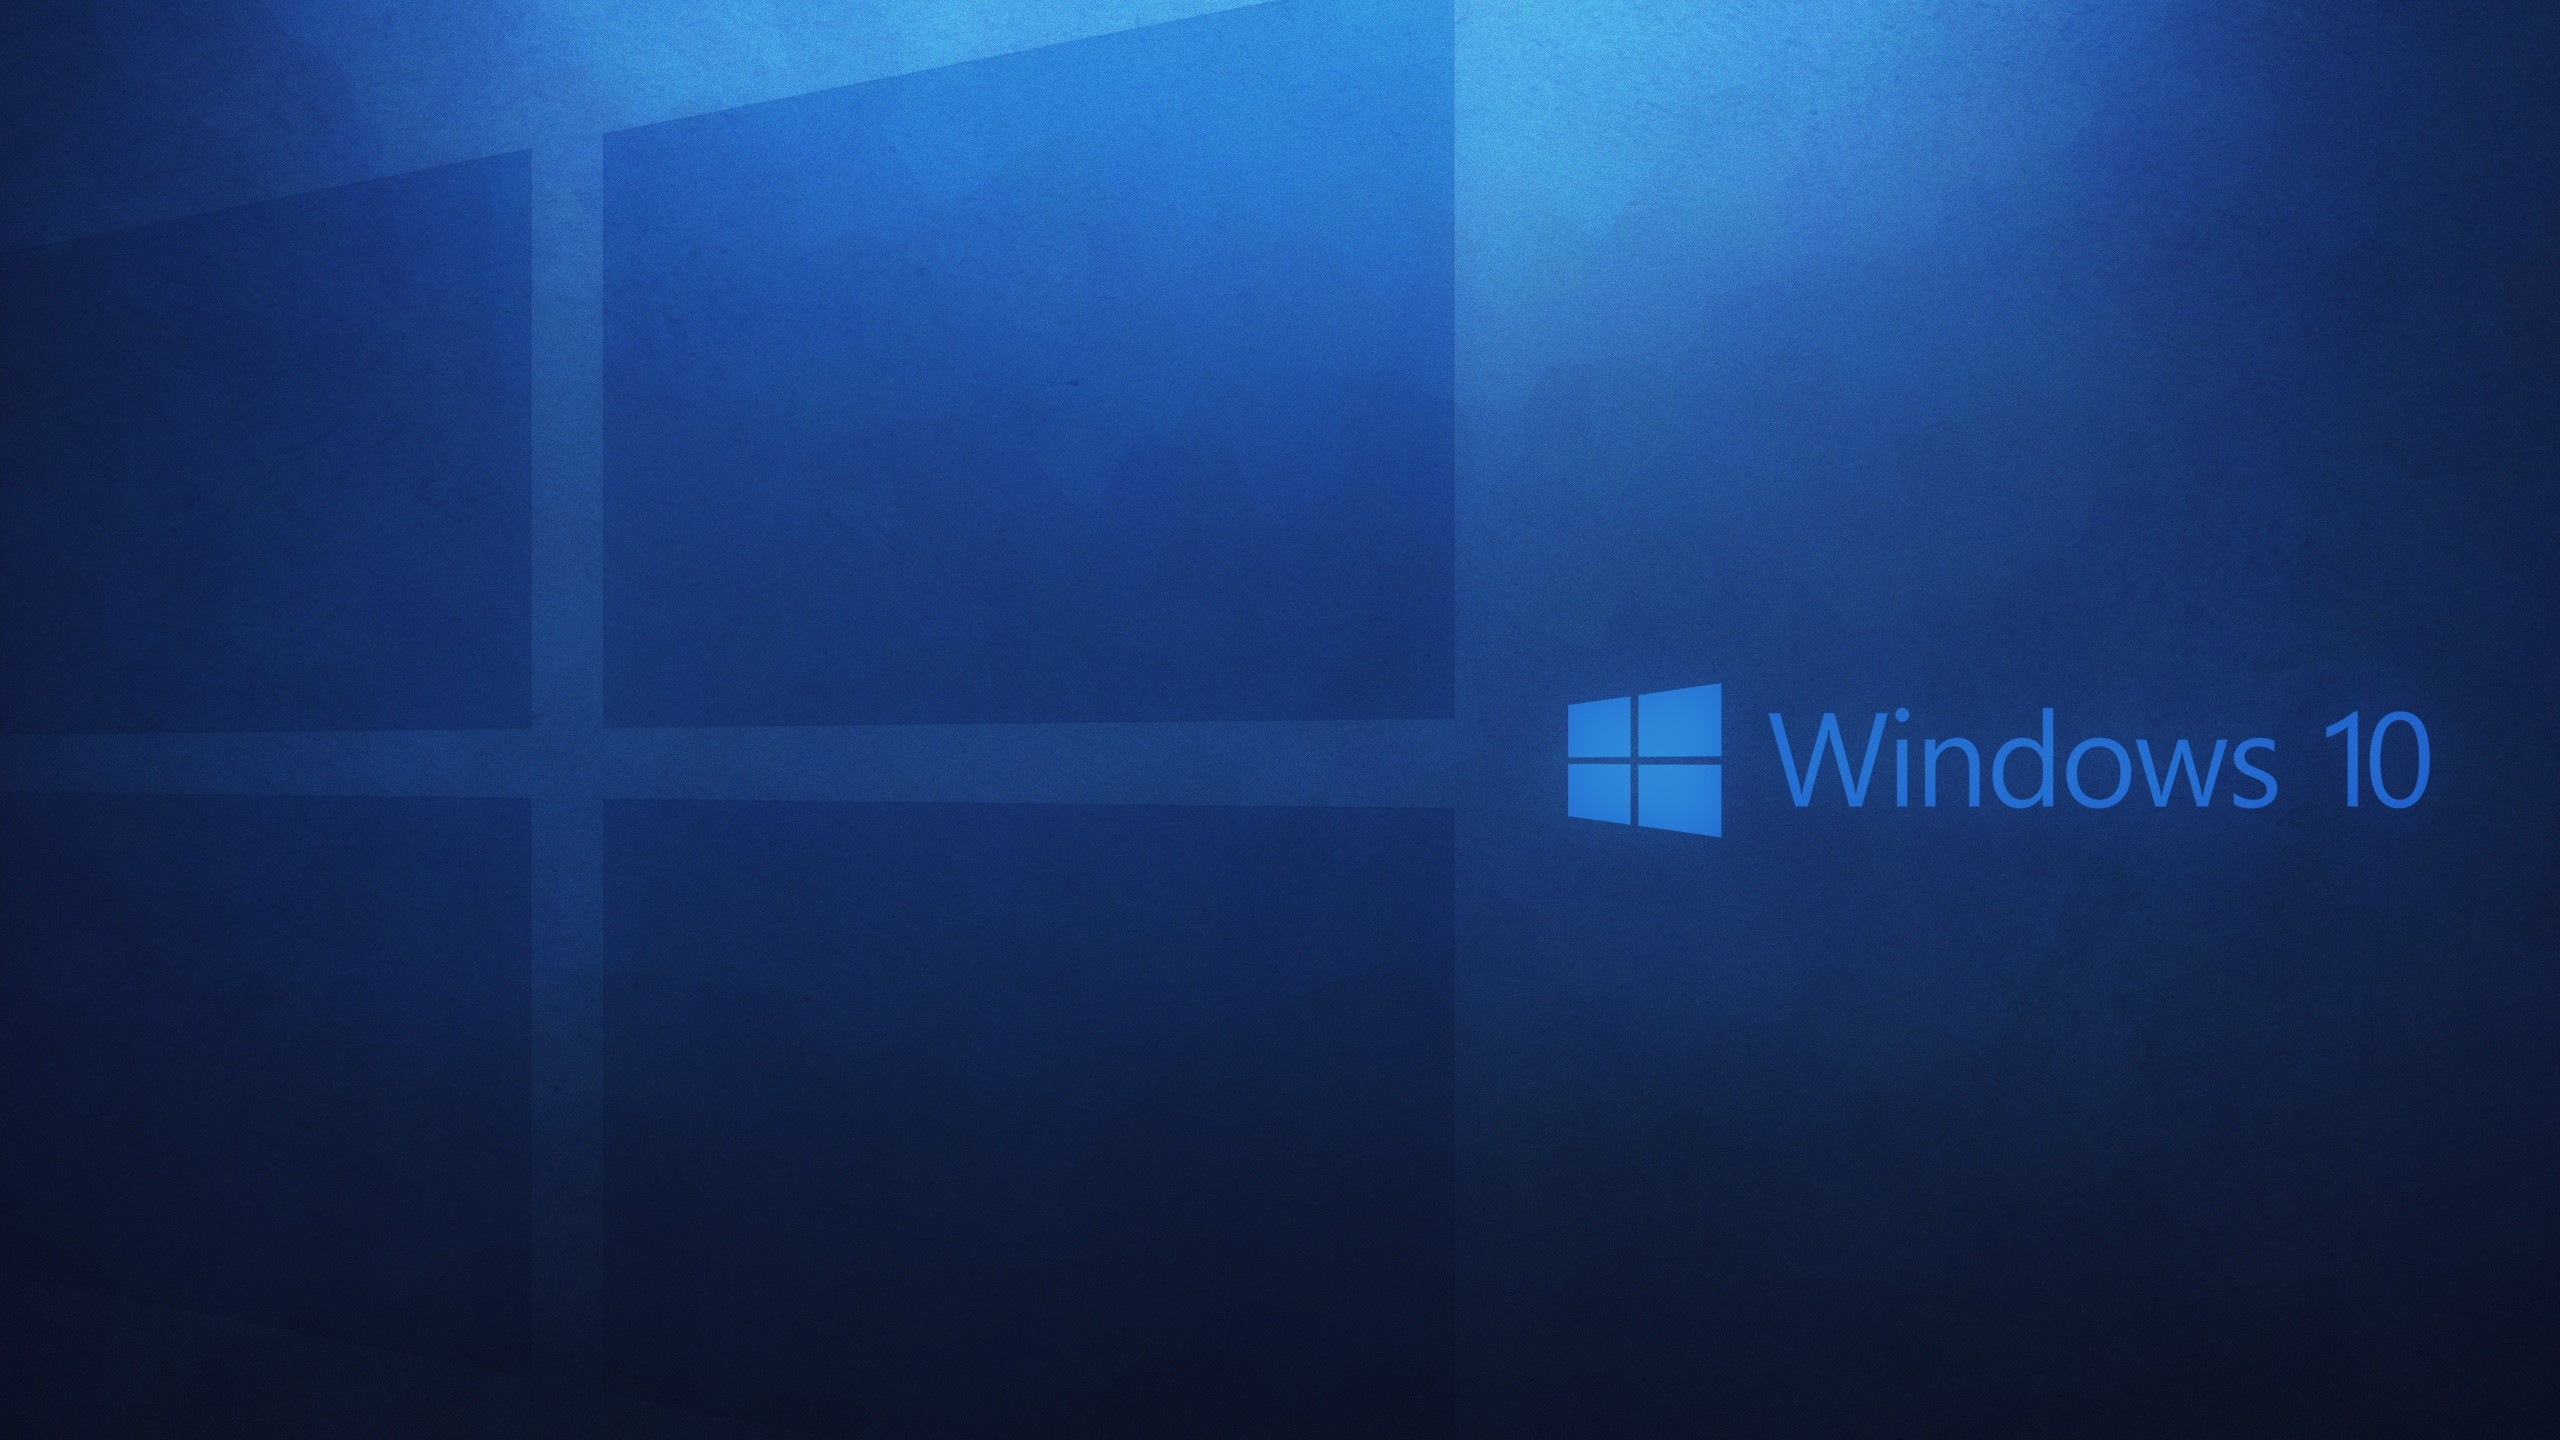 Wallpaper windows 10, microsoft, operating system